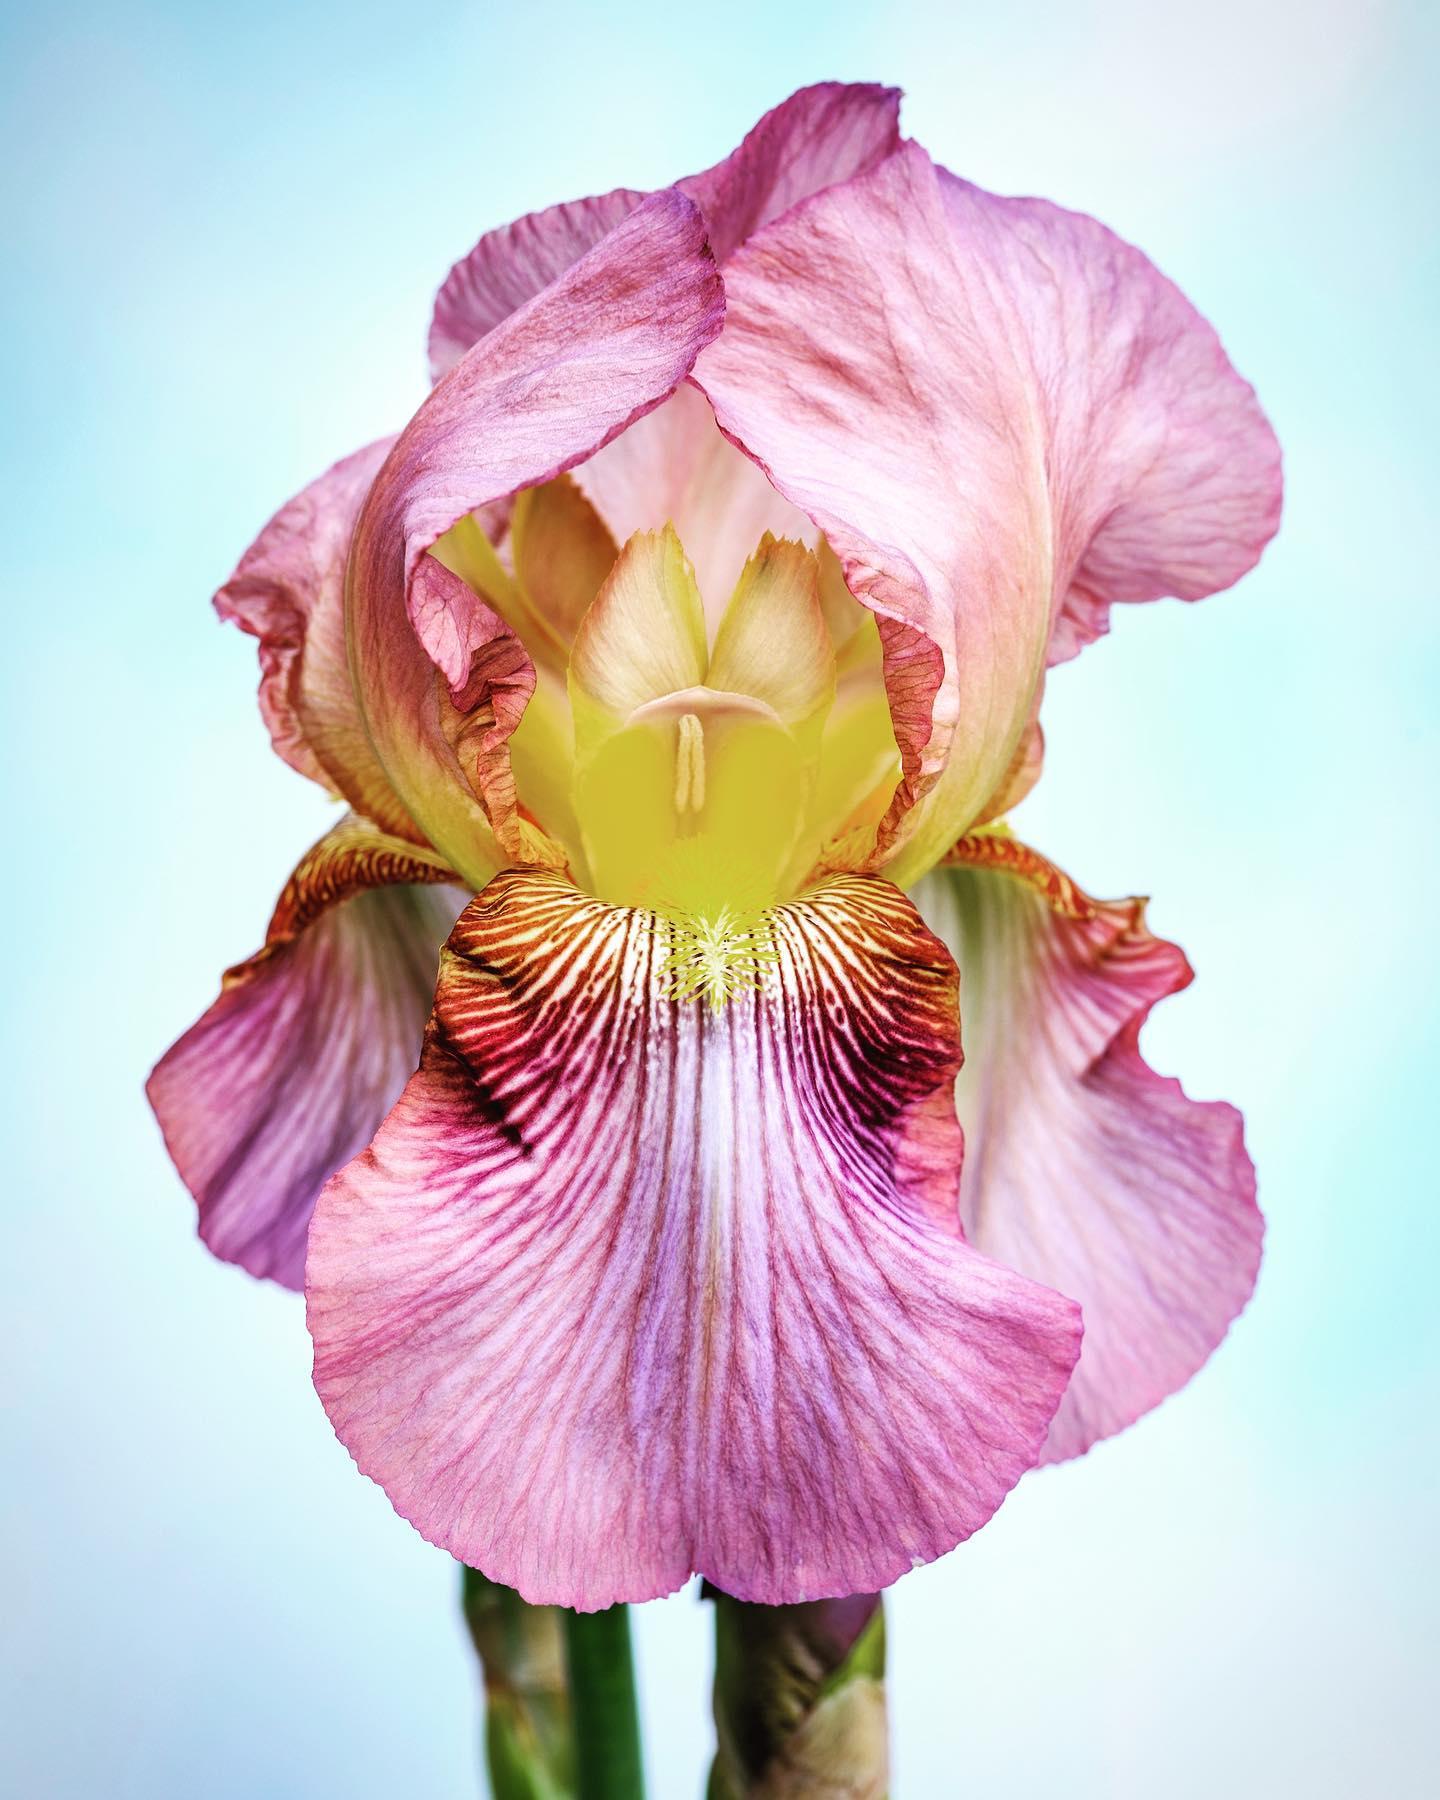 Cedric Morris Iris 'Benton Baggage'...#gardenphotographer #gardenphotography #plantphotography #cedricmorris #cedricmorrisirises #irisbentonbaggage #botanicalphotography #nikonphotography #nikonuk #nikonphotographer #bentonend #bentonirises